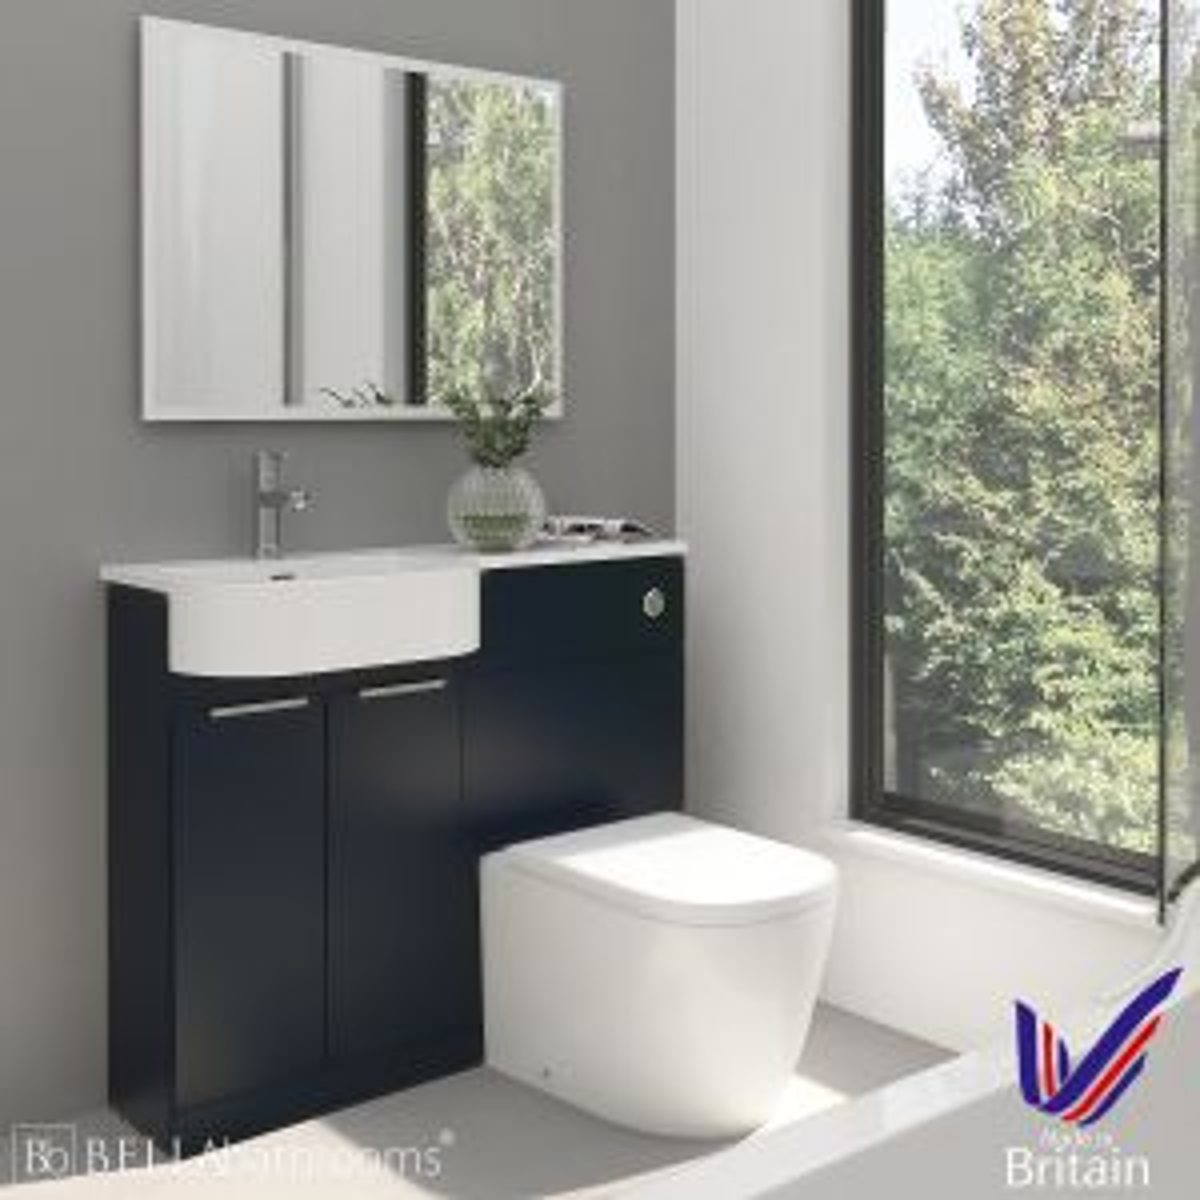 Elation Combination P Shape Indigo Matt Furniture Pack 1010mm Left Hand with Cayton Toilet